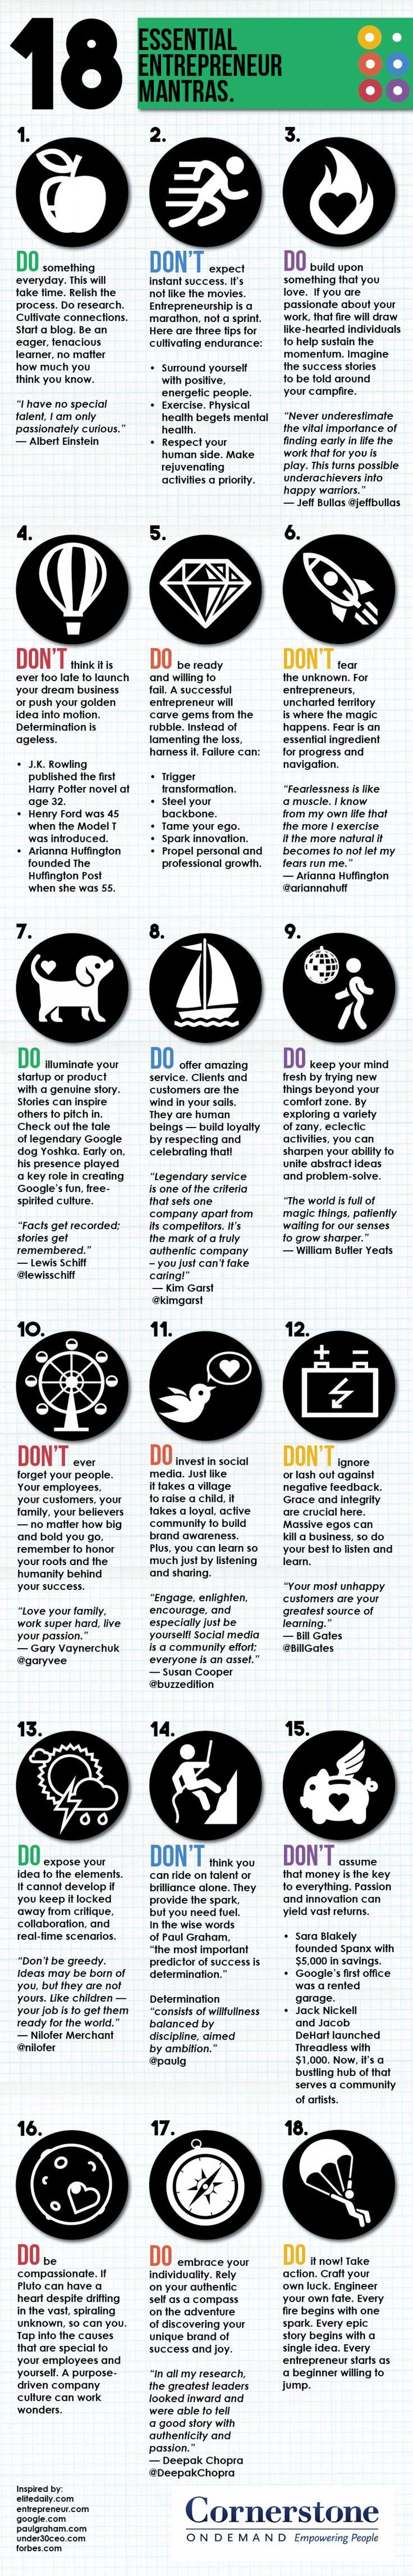 18 Essential Entrepreneur Mantras Infographic. Enjoy RushWorld Boards,  PSST... YOU MIGHT